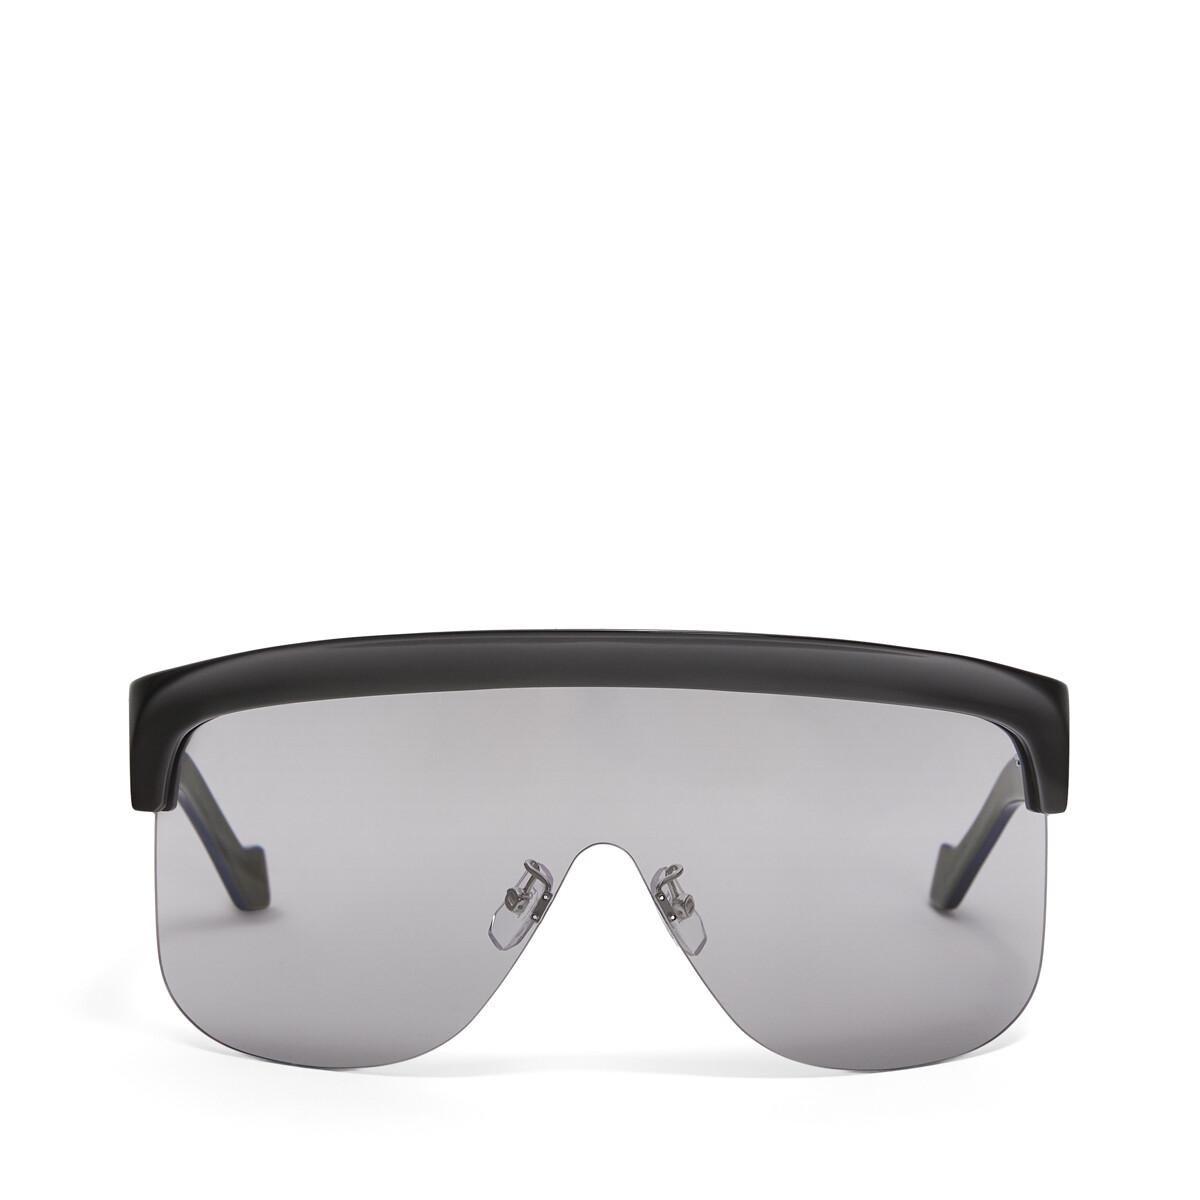 LOEWE Show Sunglasses Black front